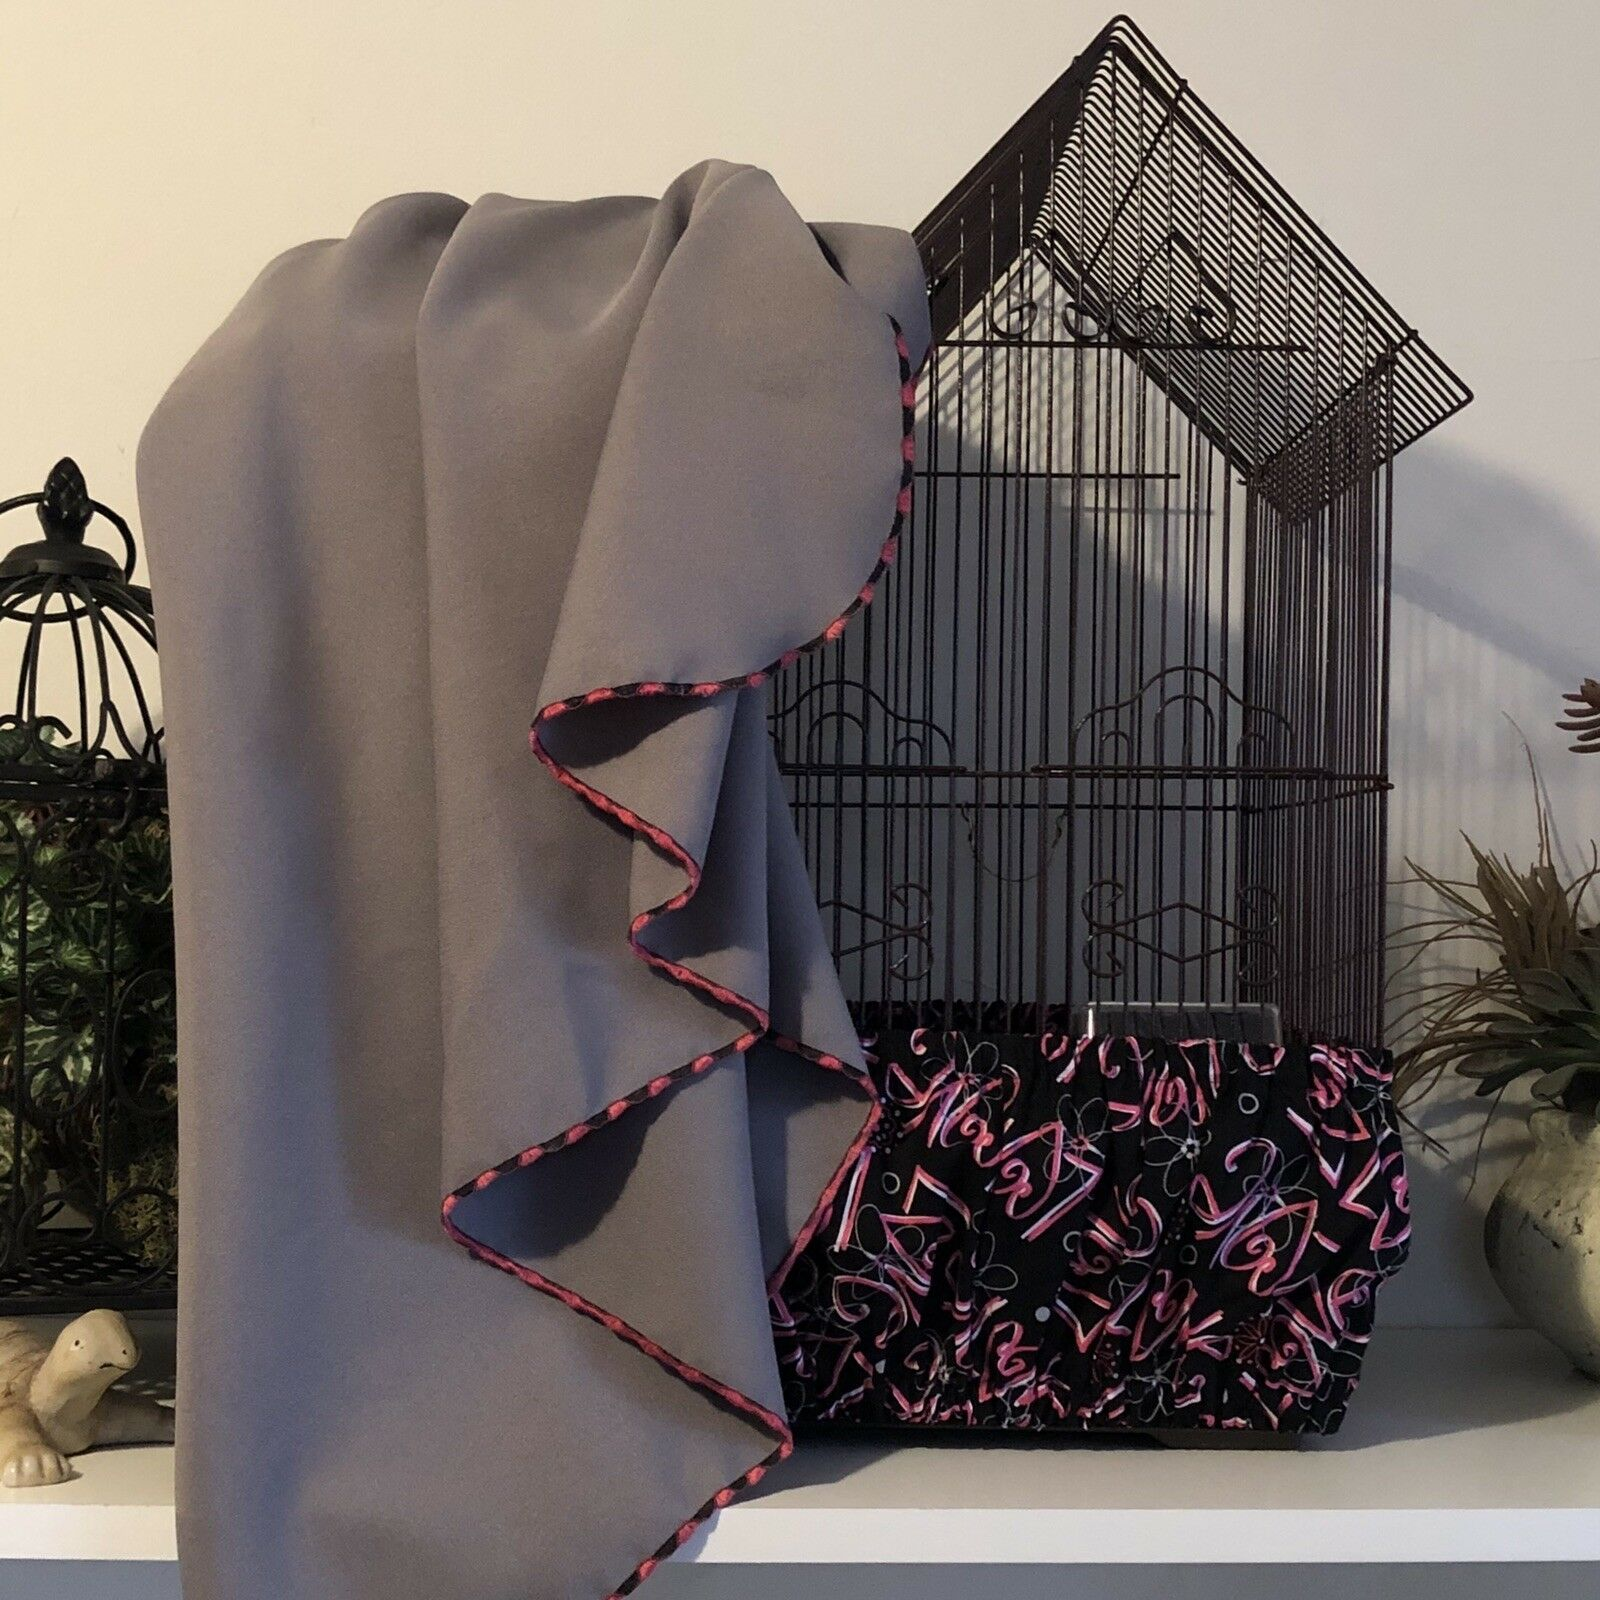 NEW NEW NEW SET Handmade Love-Rosa grau Bird Cage Skirt Seed Catcher & Matching Cover bd2fe5